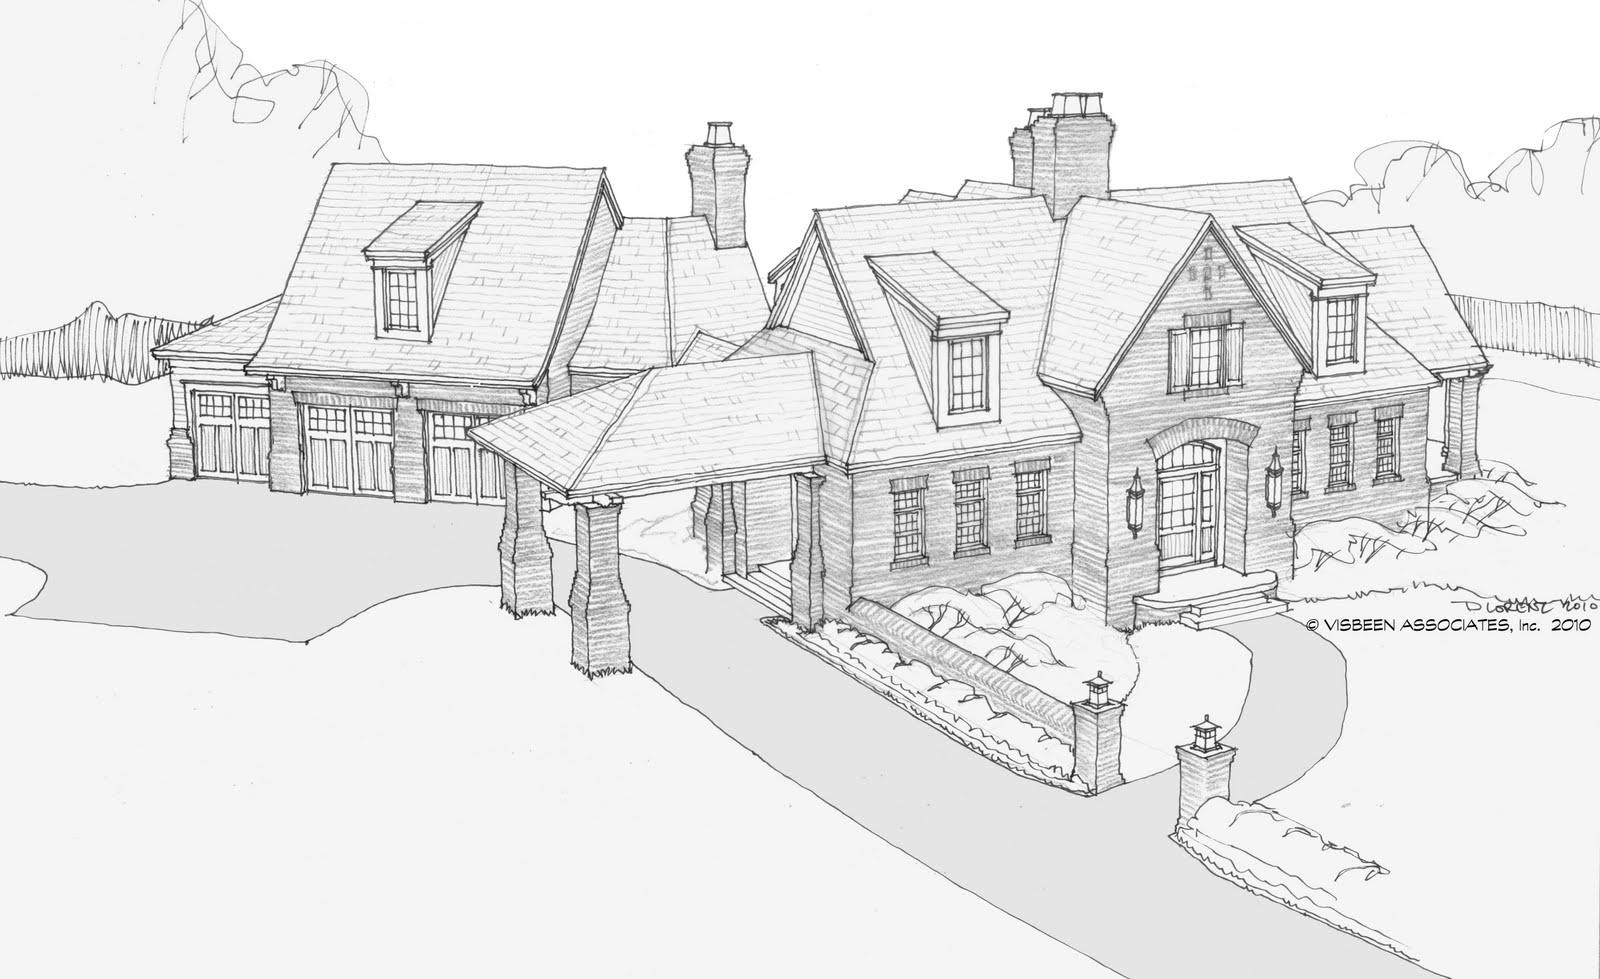 Wilcox Gardens Visbeen Architects - Featured designer visbeen associates